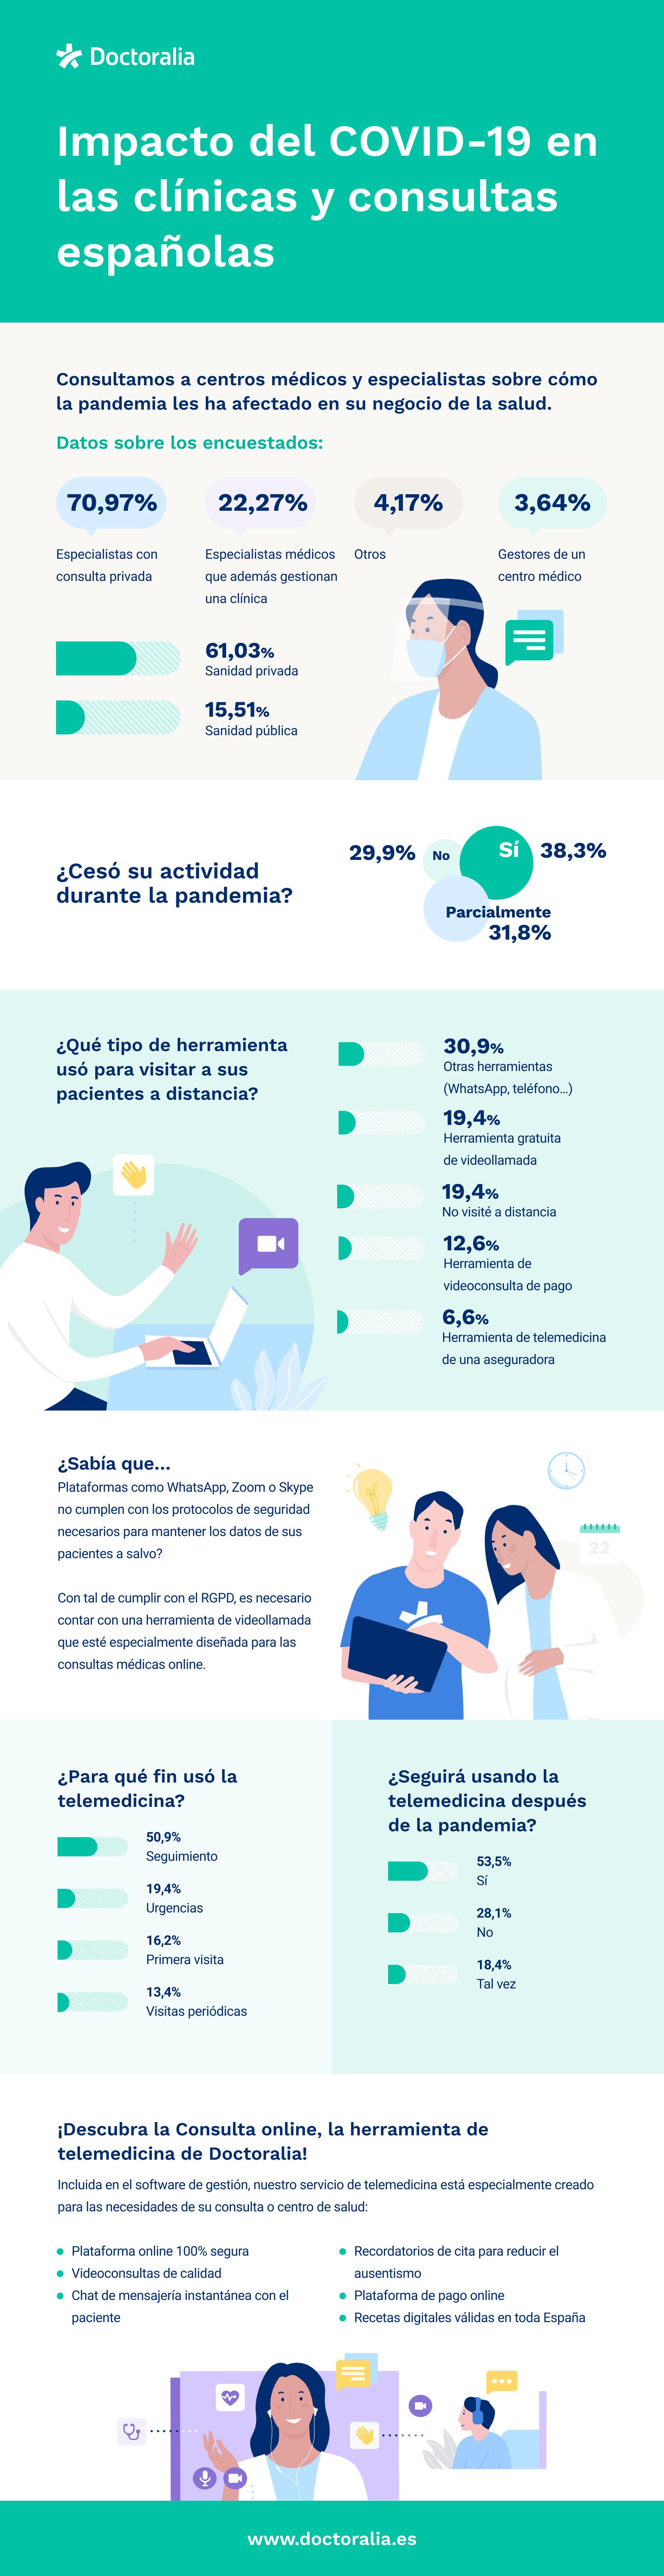 es-infographic-covid19@2x